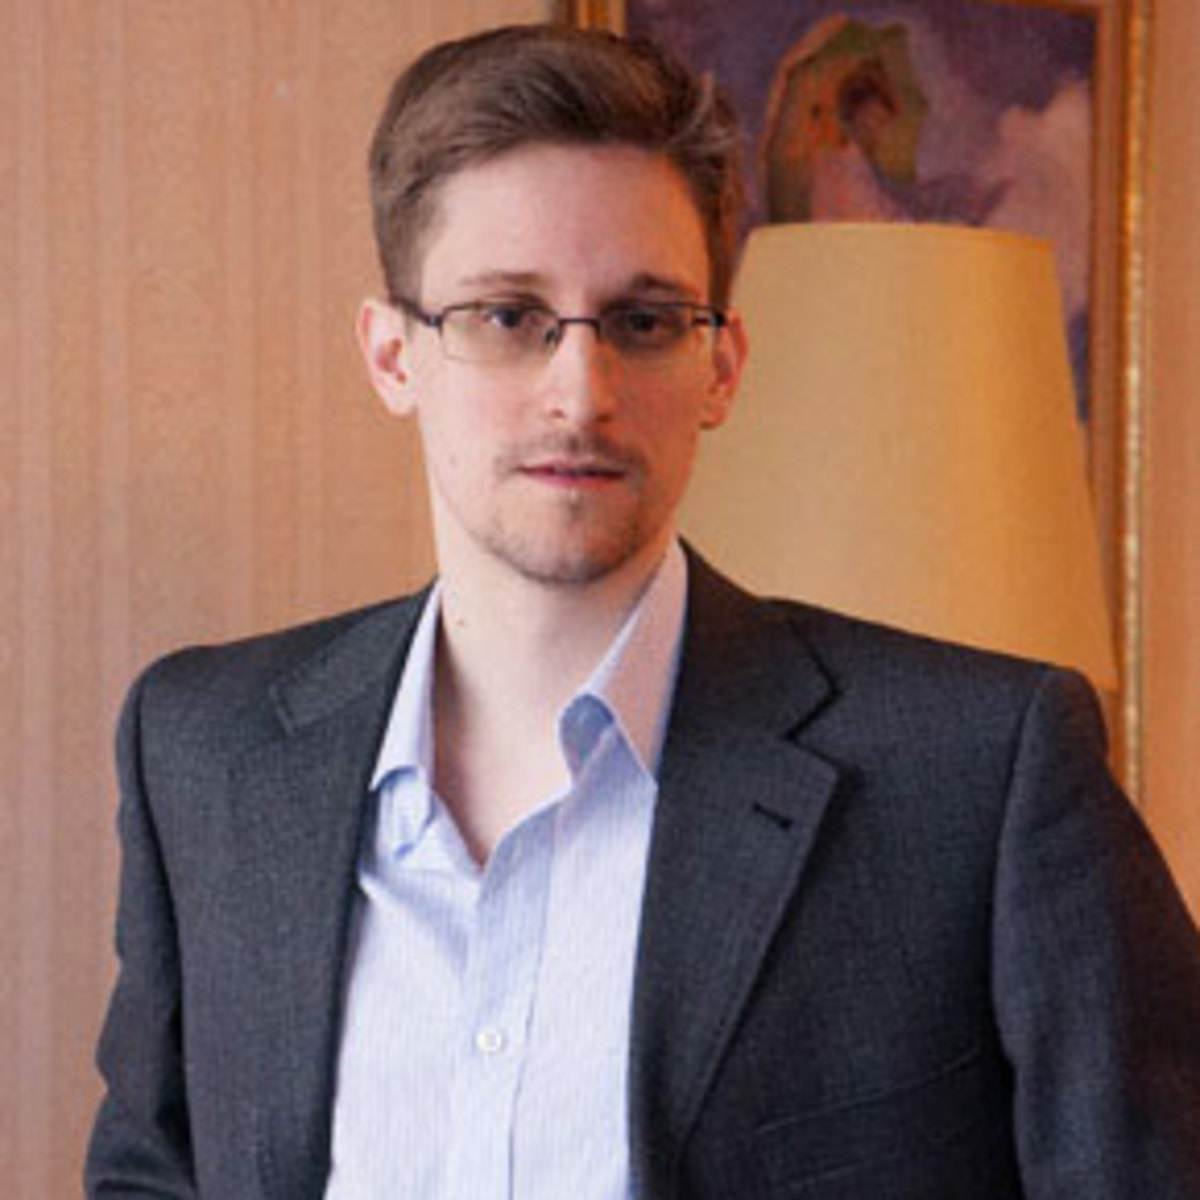 Operation Snow Job: The Edward Snowden Story